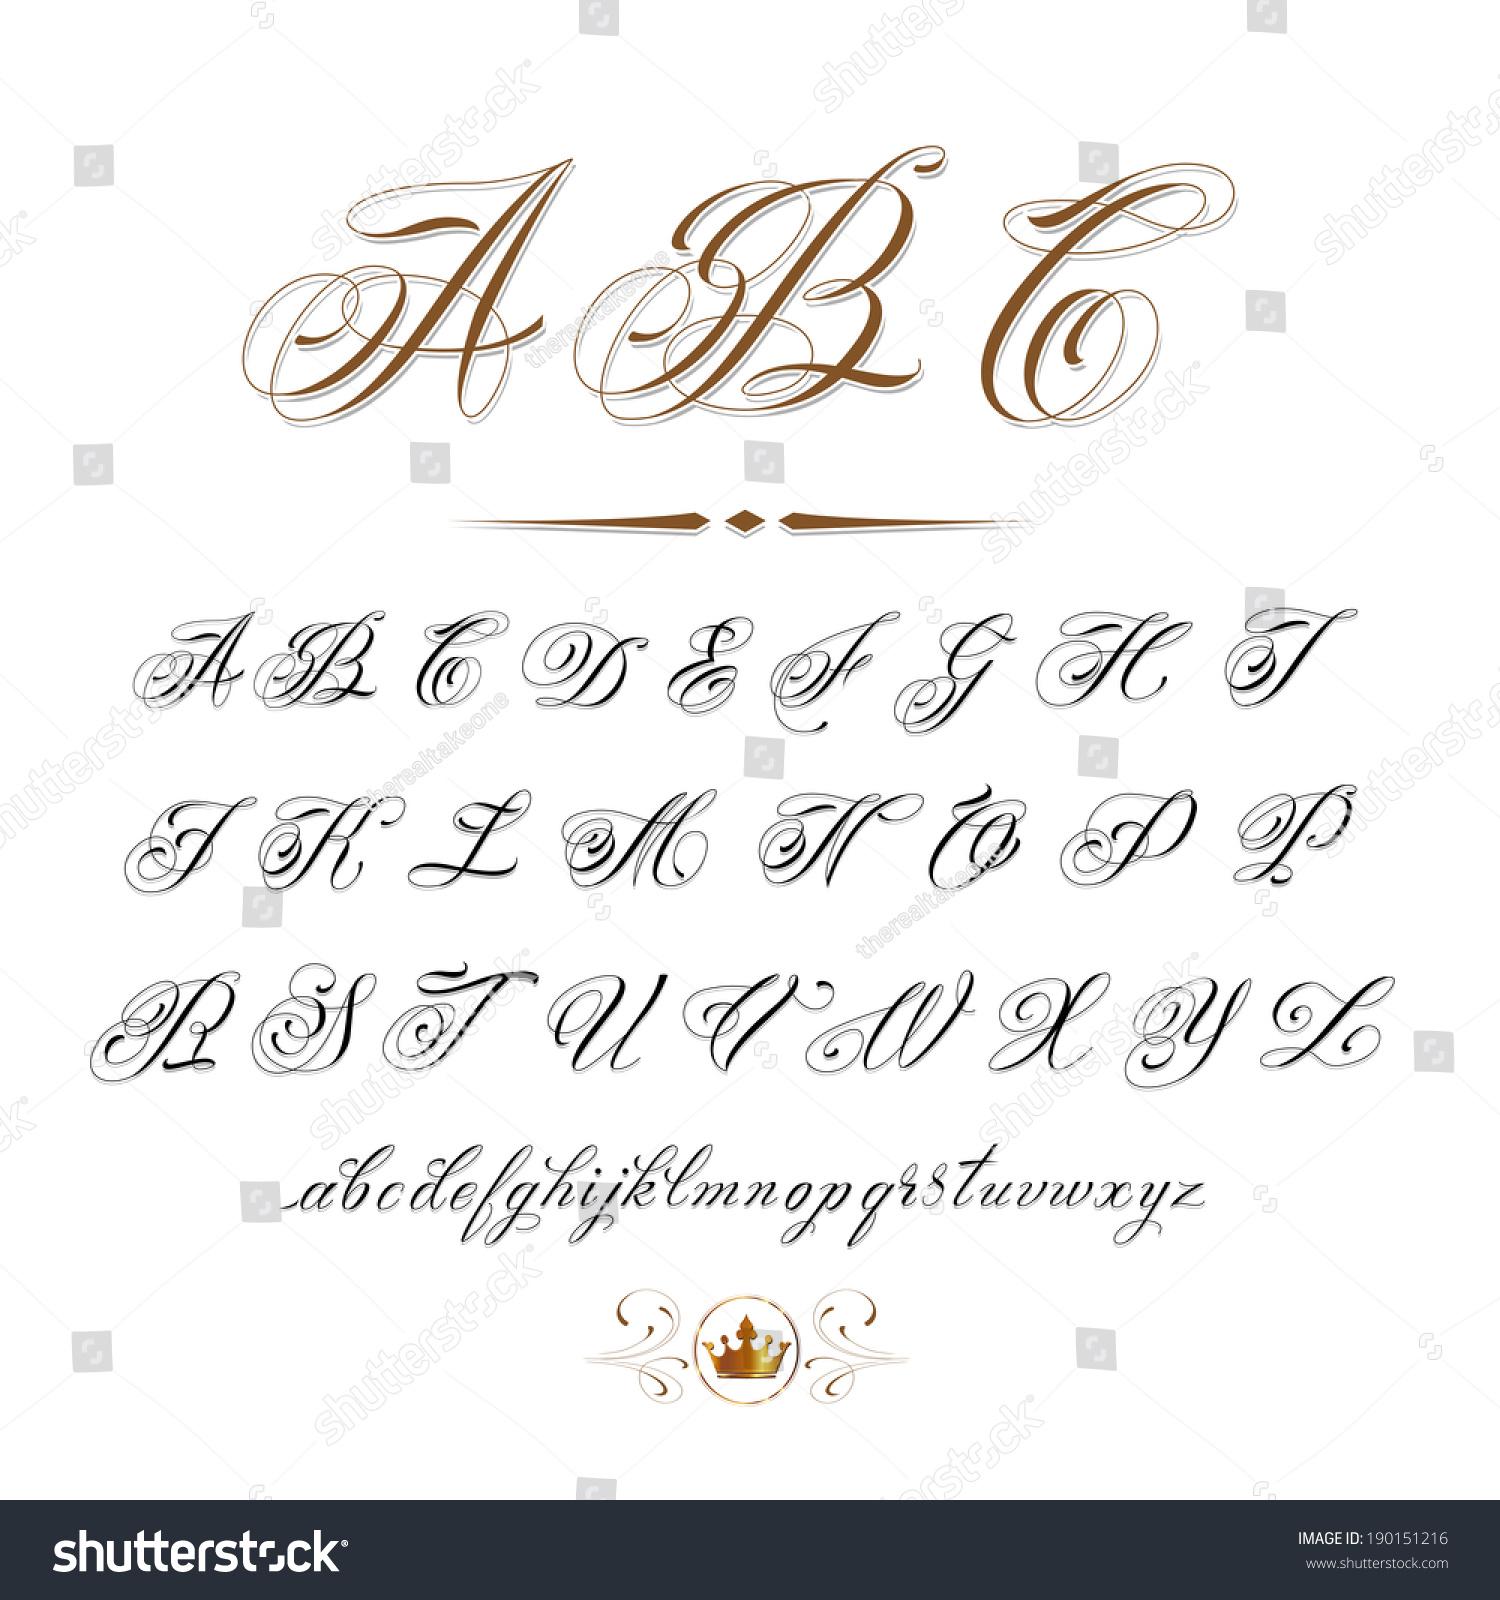 Vector hand drawn calligraphic alphabet based on